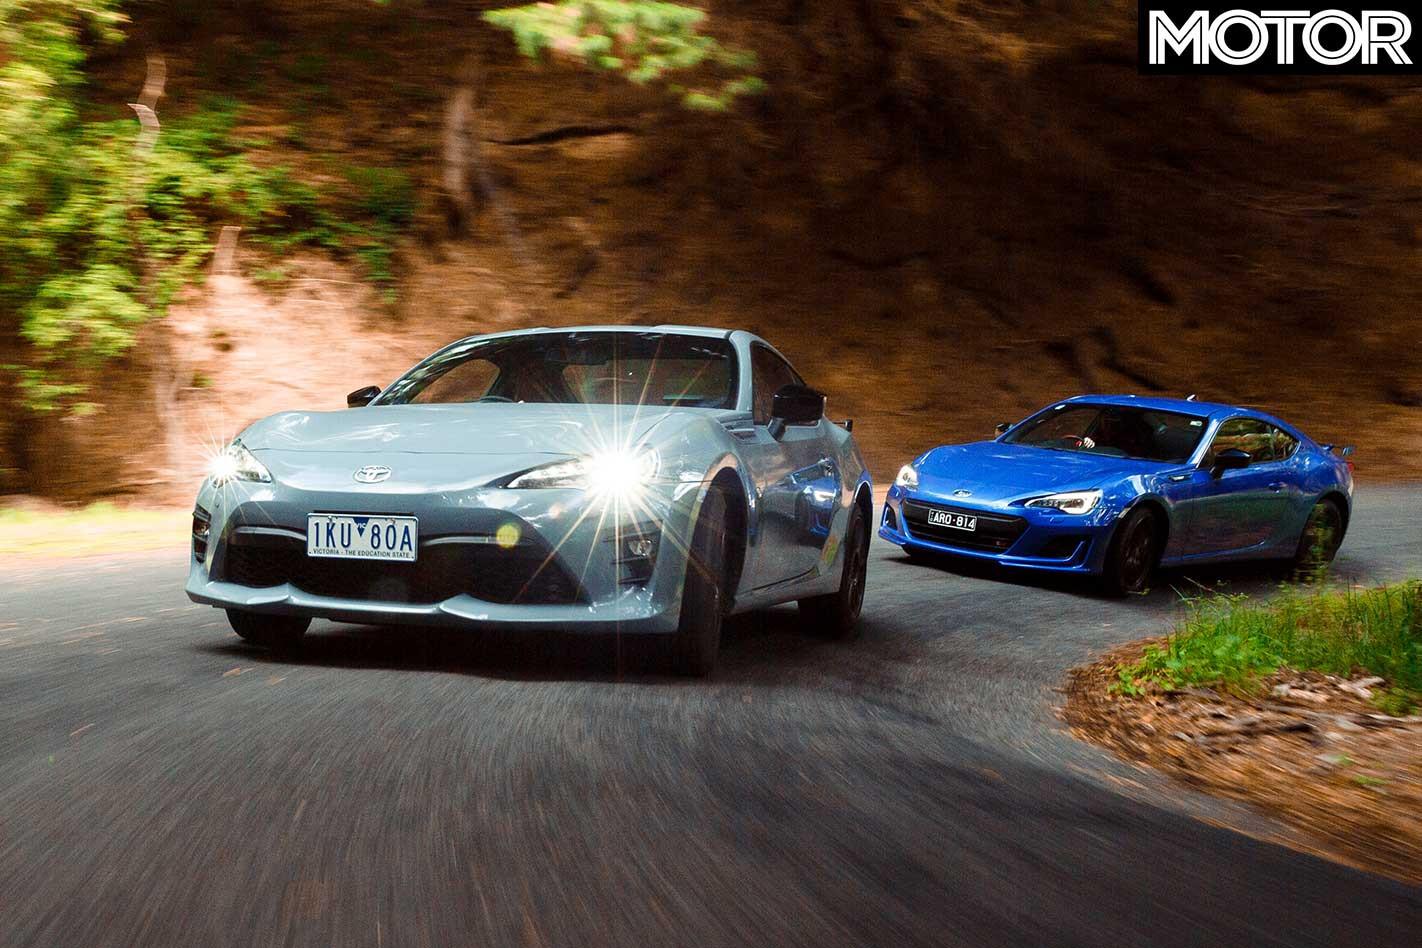 2018 Subaru Brz Ts Vs Toyota 86 Pp Comparison Drive Handling Jpg